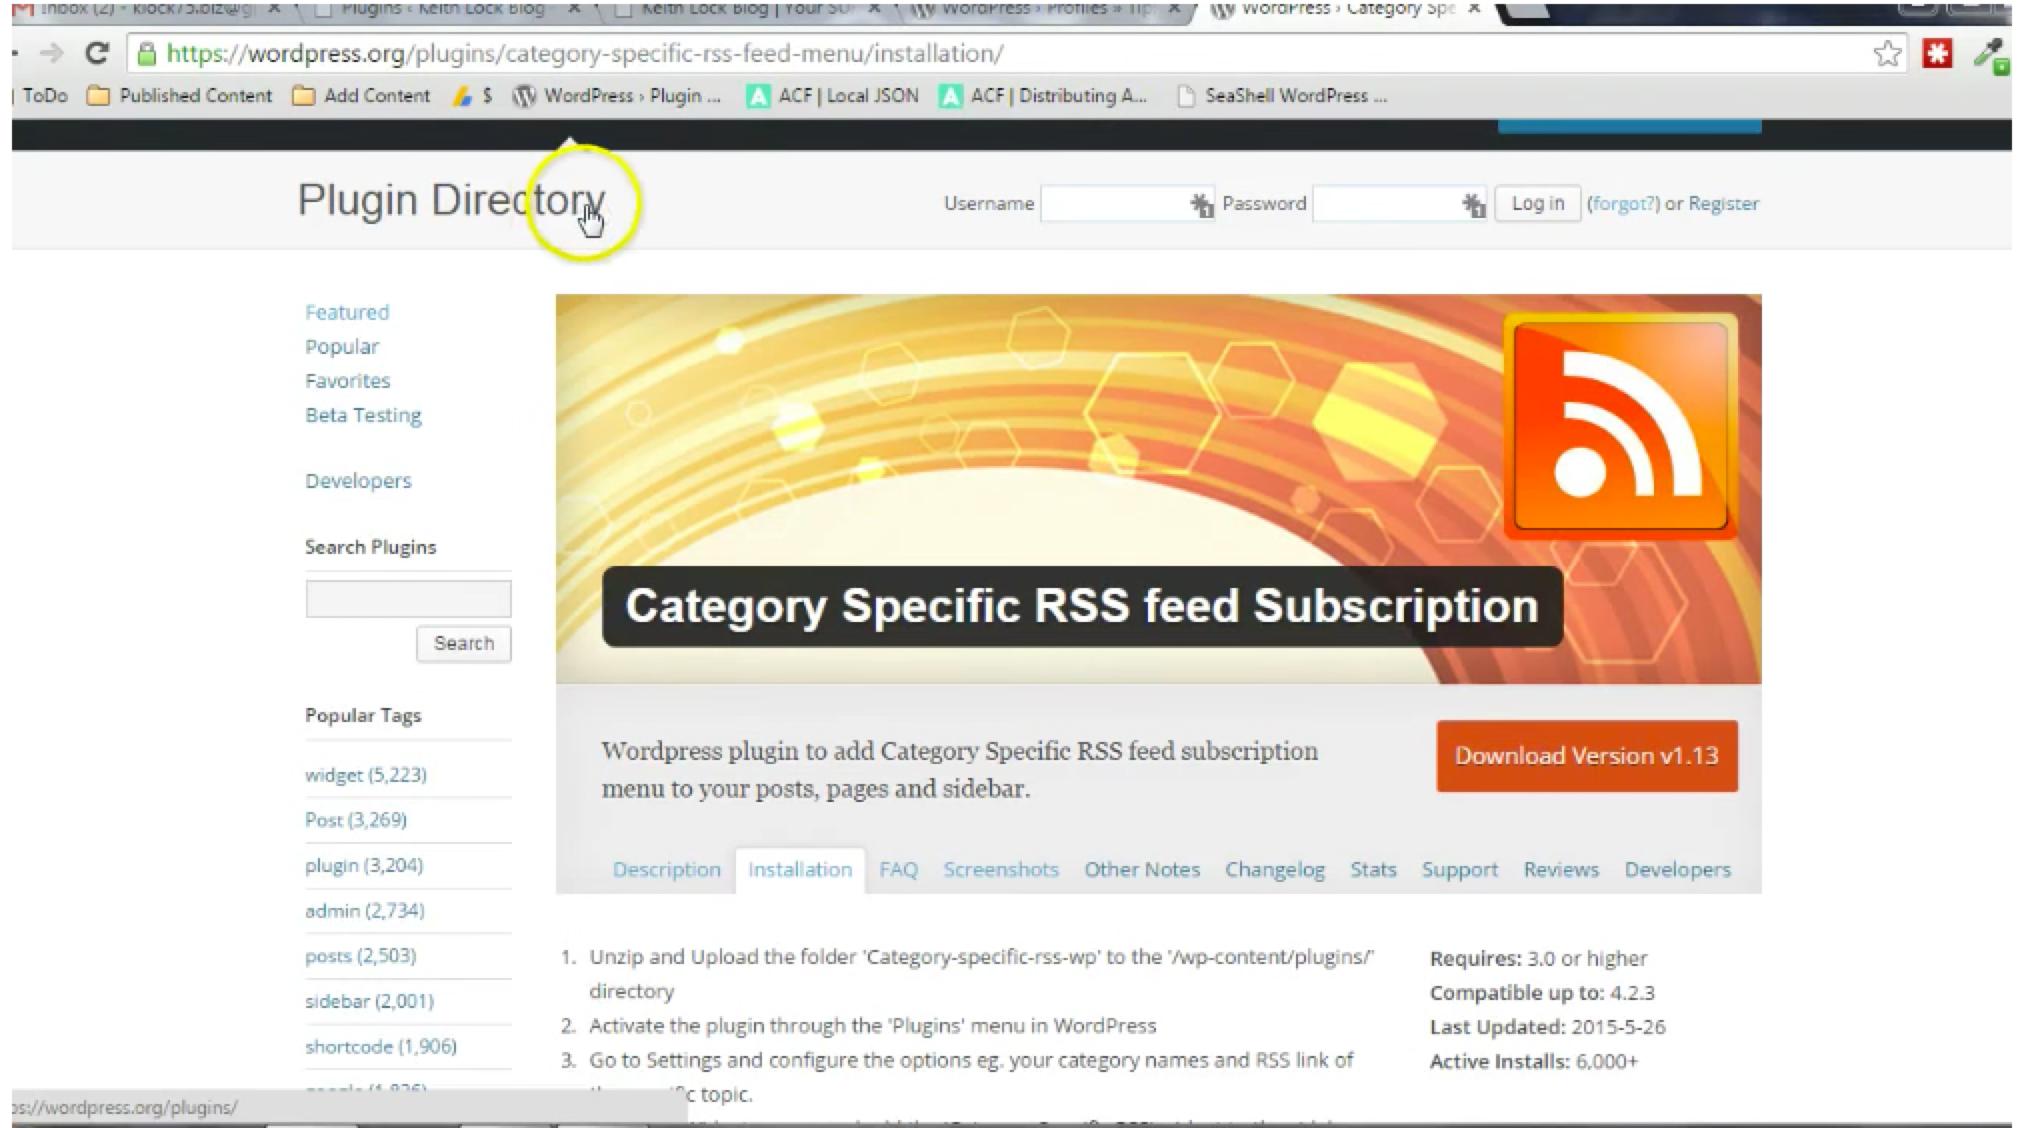 Category Specific RSS Menu PlugIn